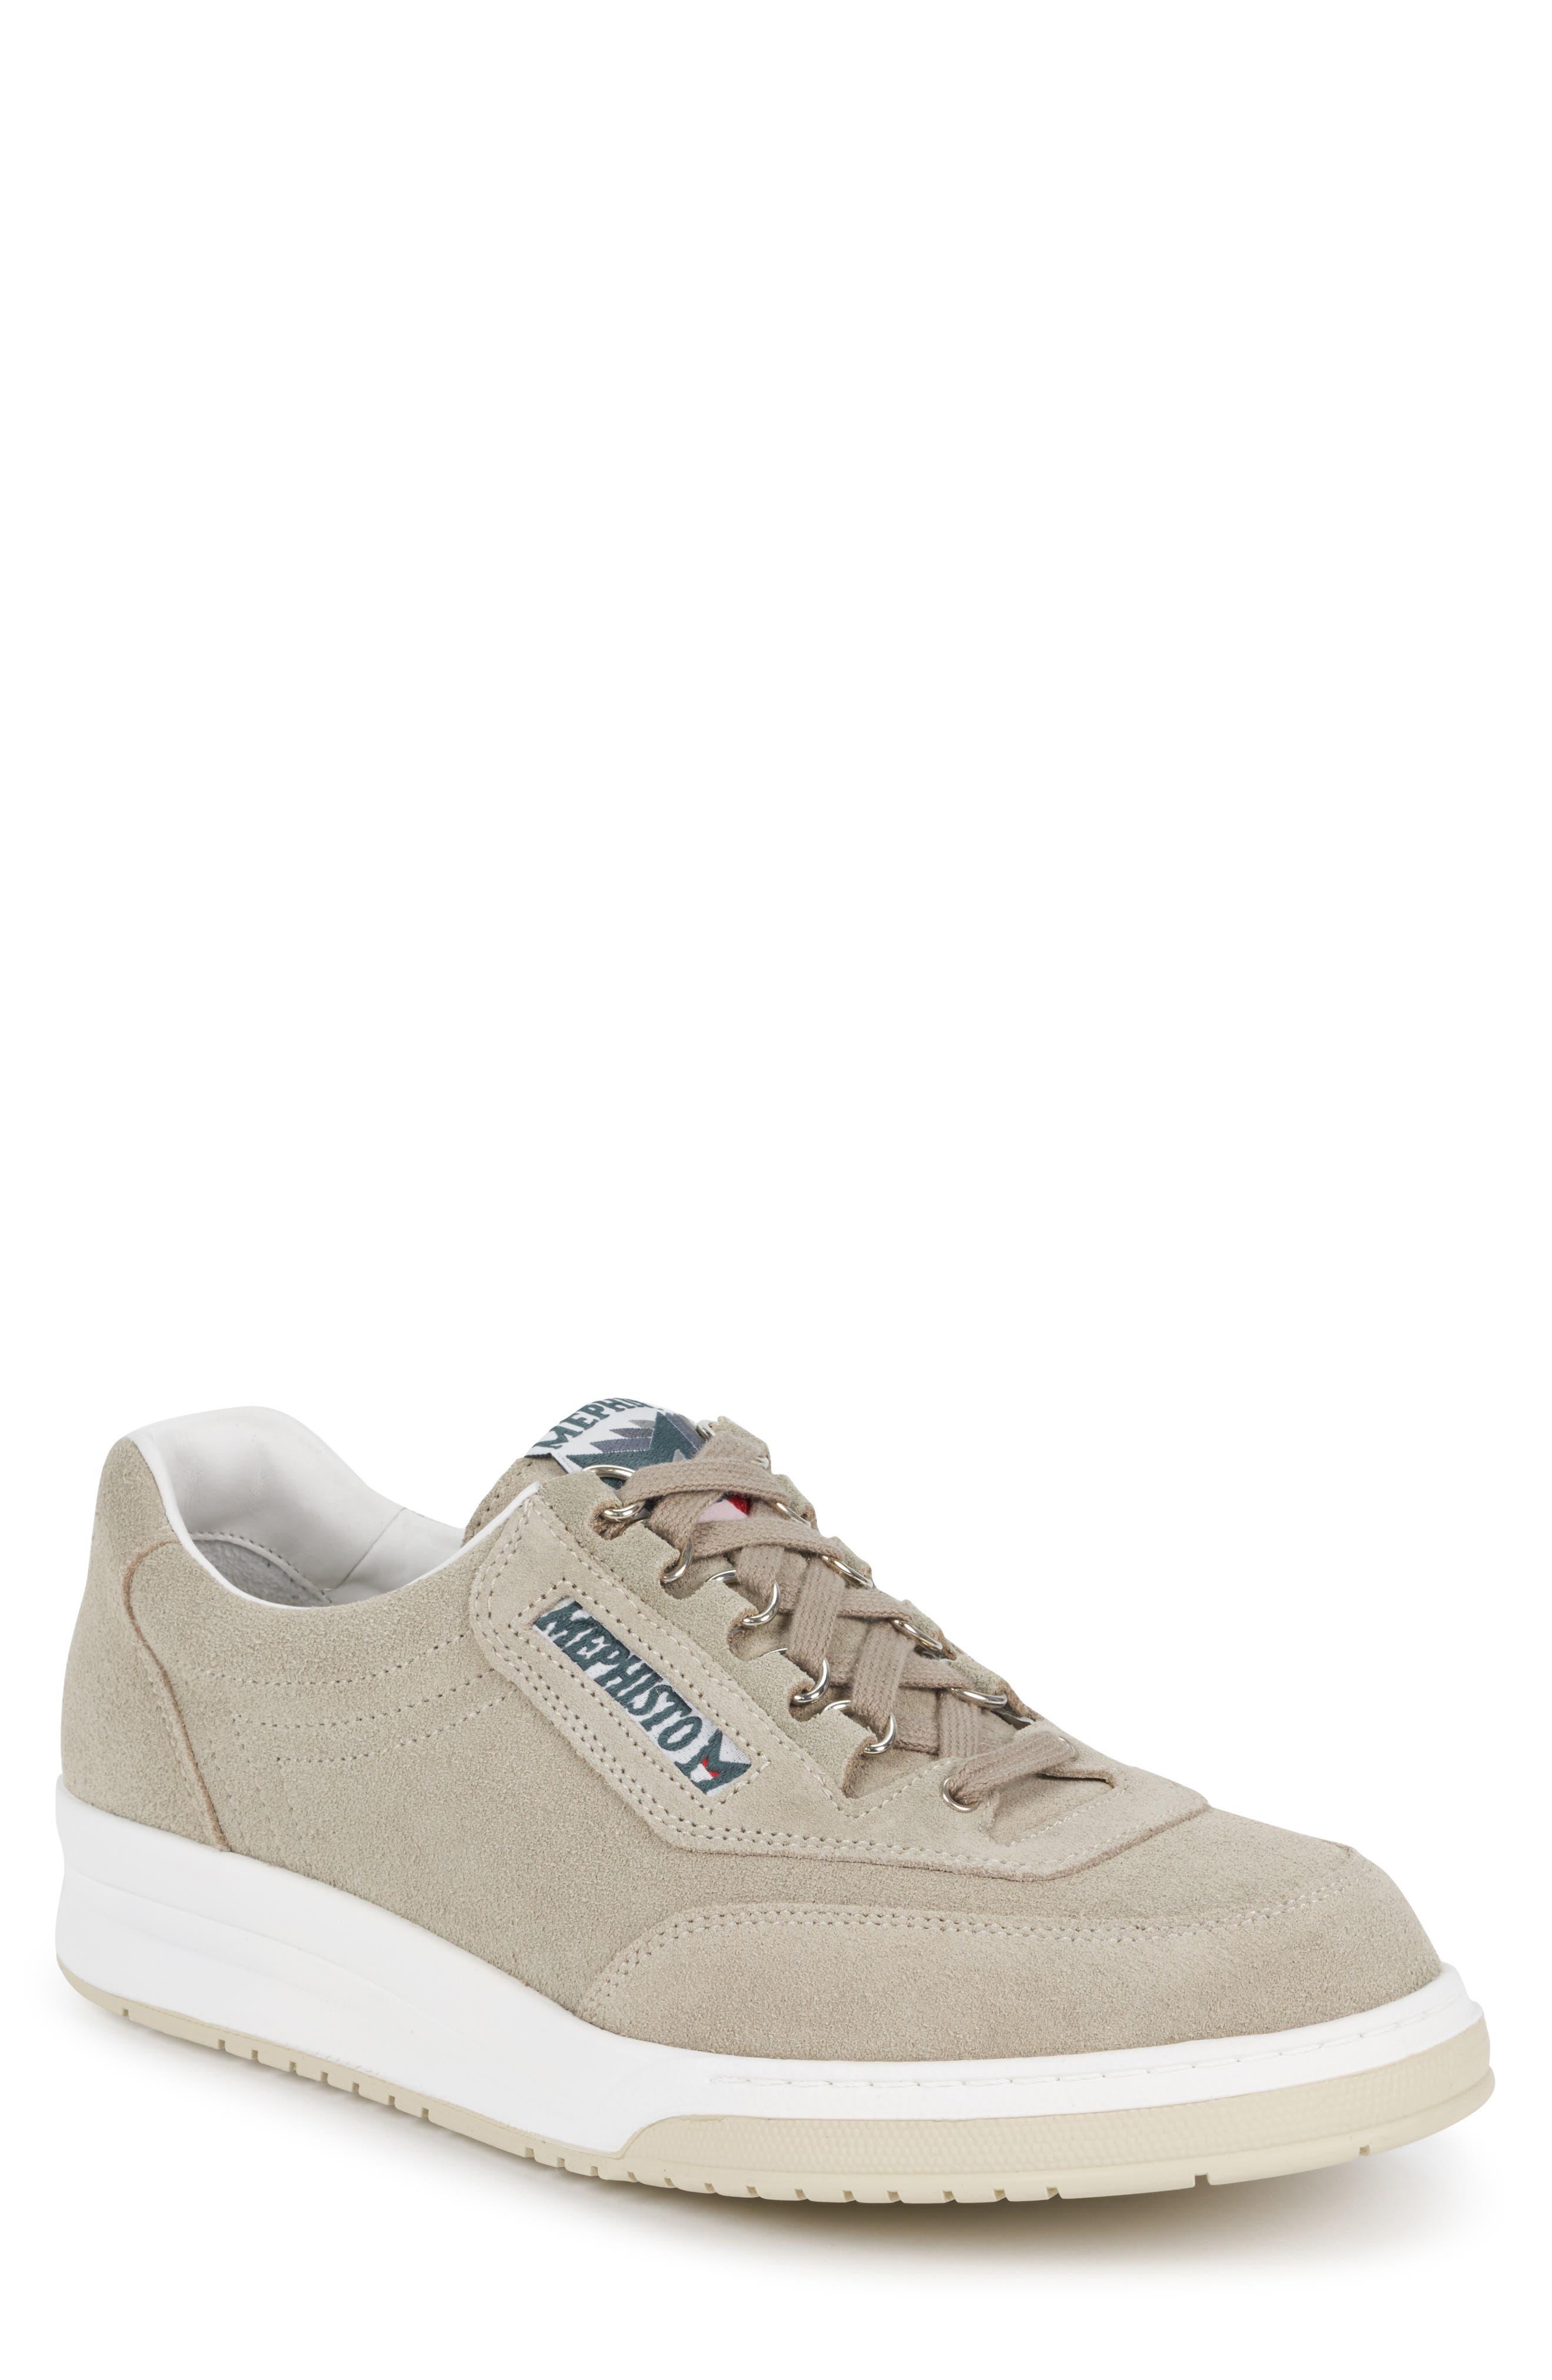 MEPHISTO, 'Match' Walking Shoe, Main thumbnail 1, color, CAMEL